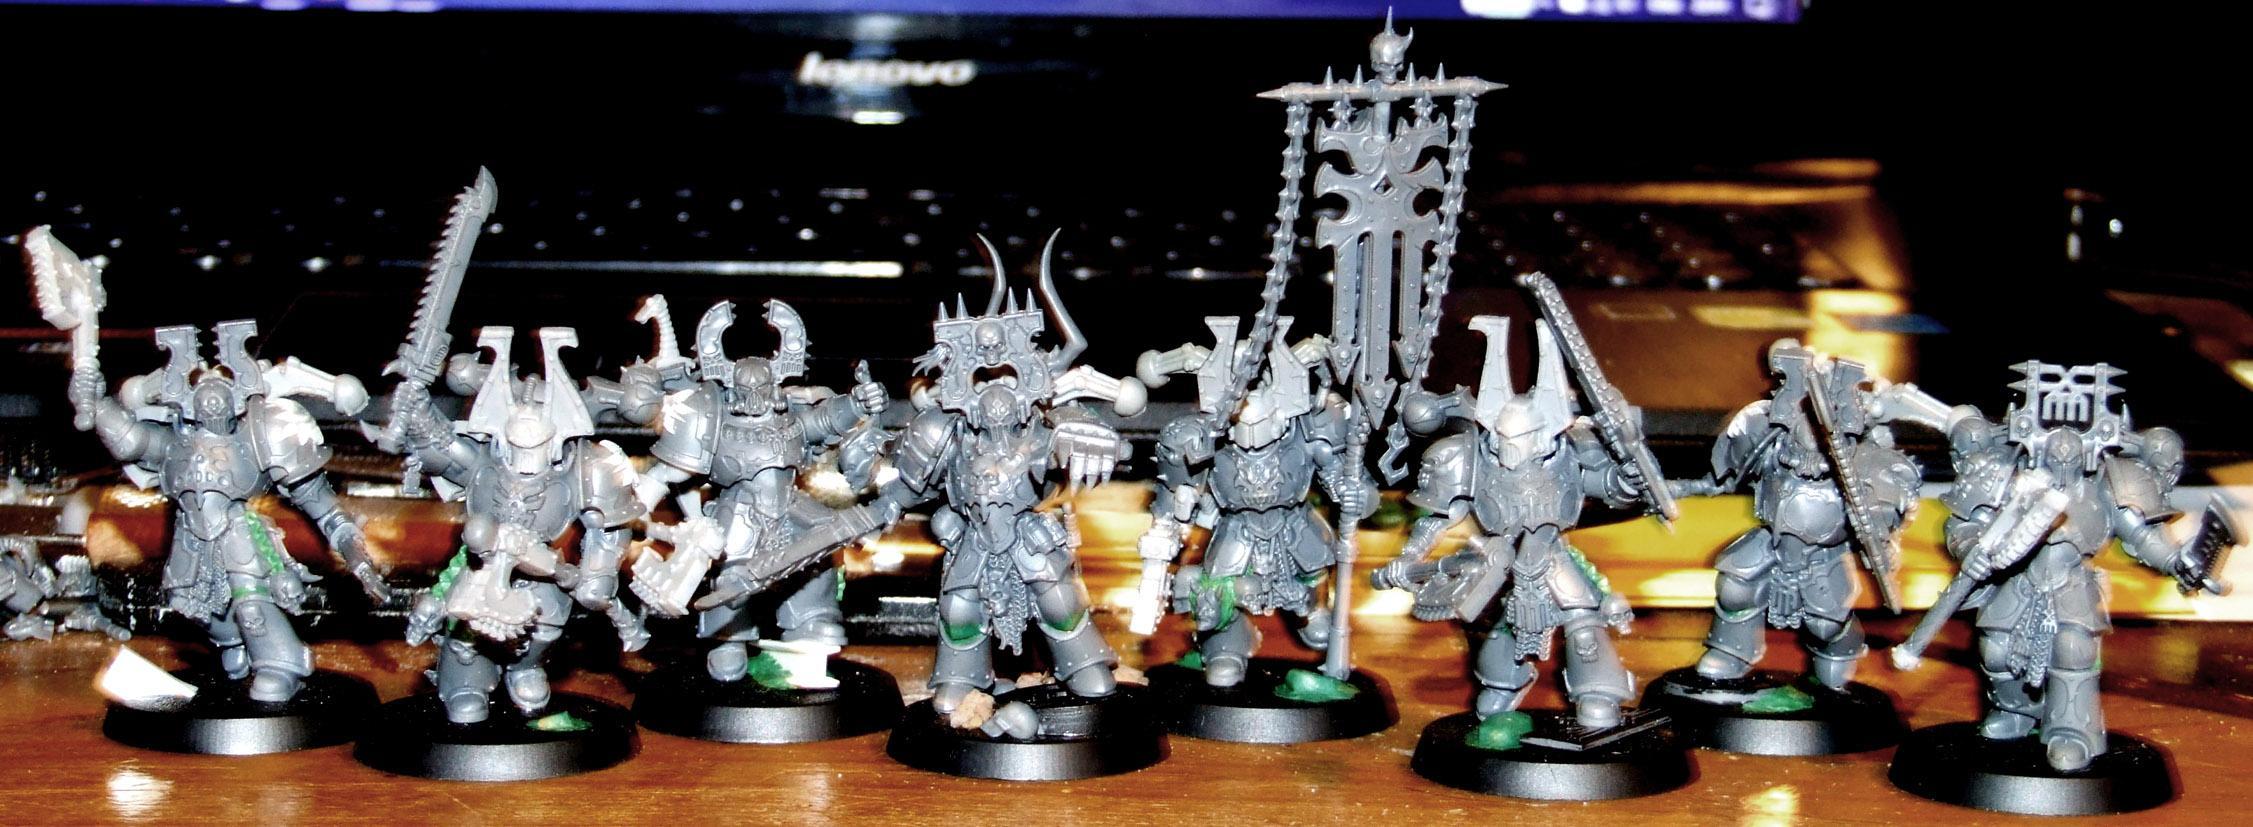 Berserkers, Chaos Space Marines, Conversion, Kitbash, Warhammer 40,000, Work In Progress